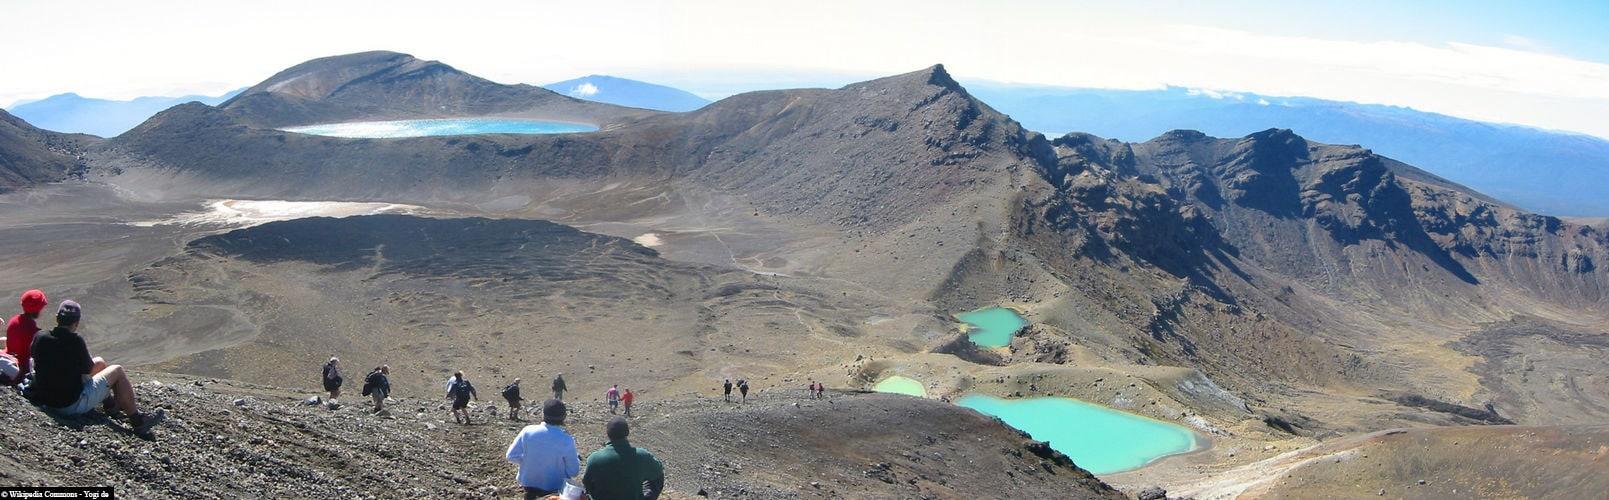 Tongariro Alpine Crossing, Neuseeland, Nordinsel, Reisebericht